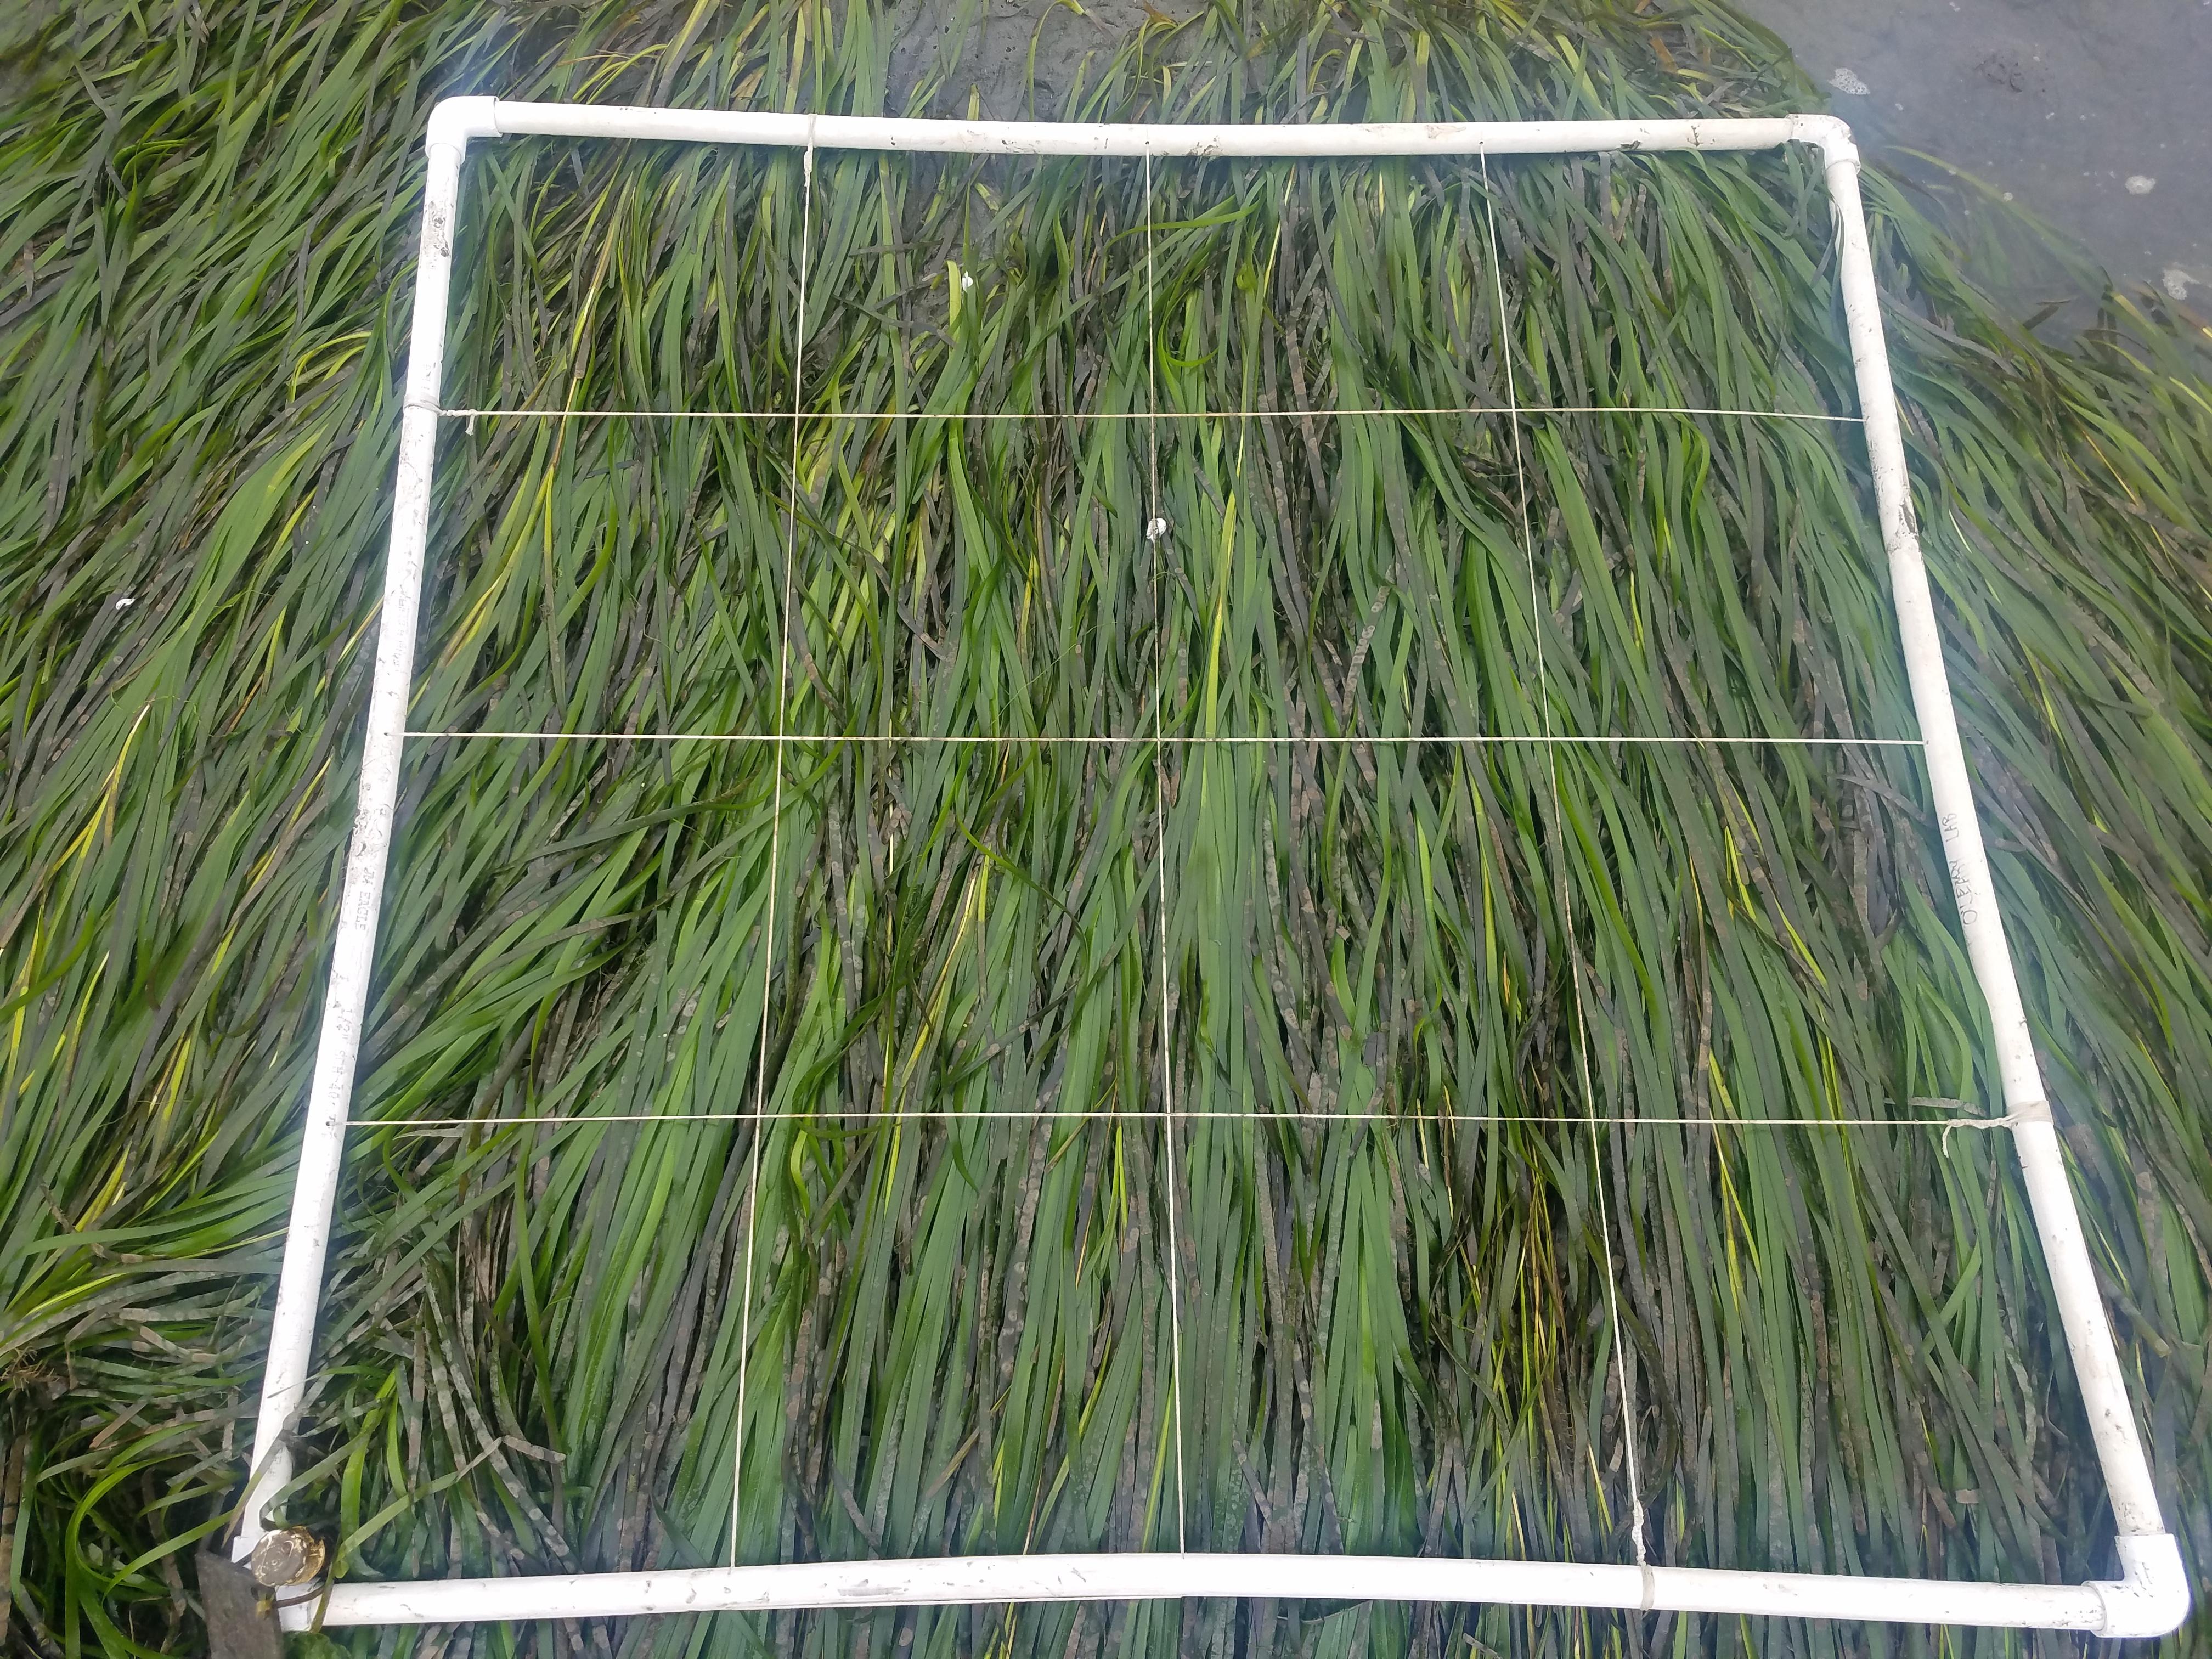 Eelgrass plot quadrat